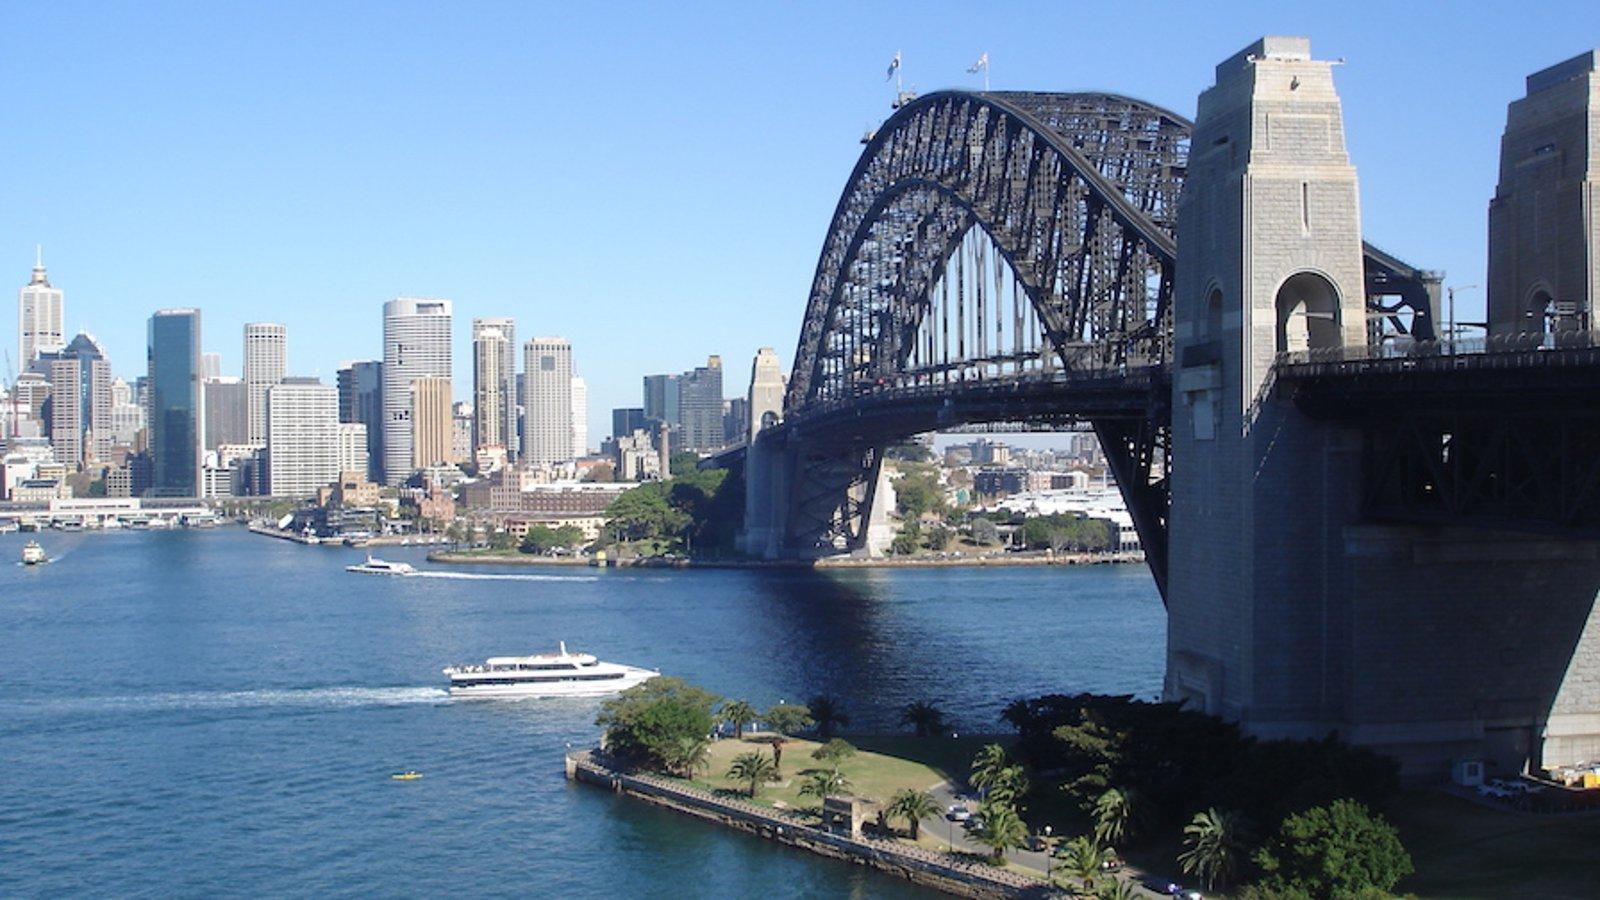 Sydney - Into the 21st Century